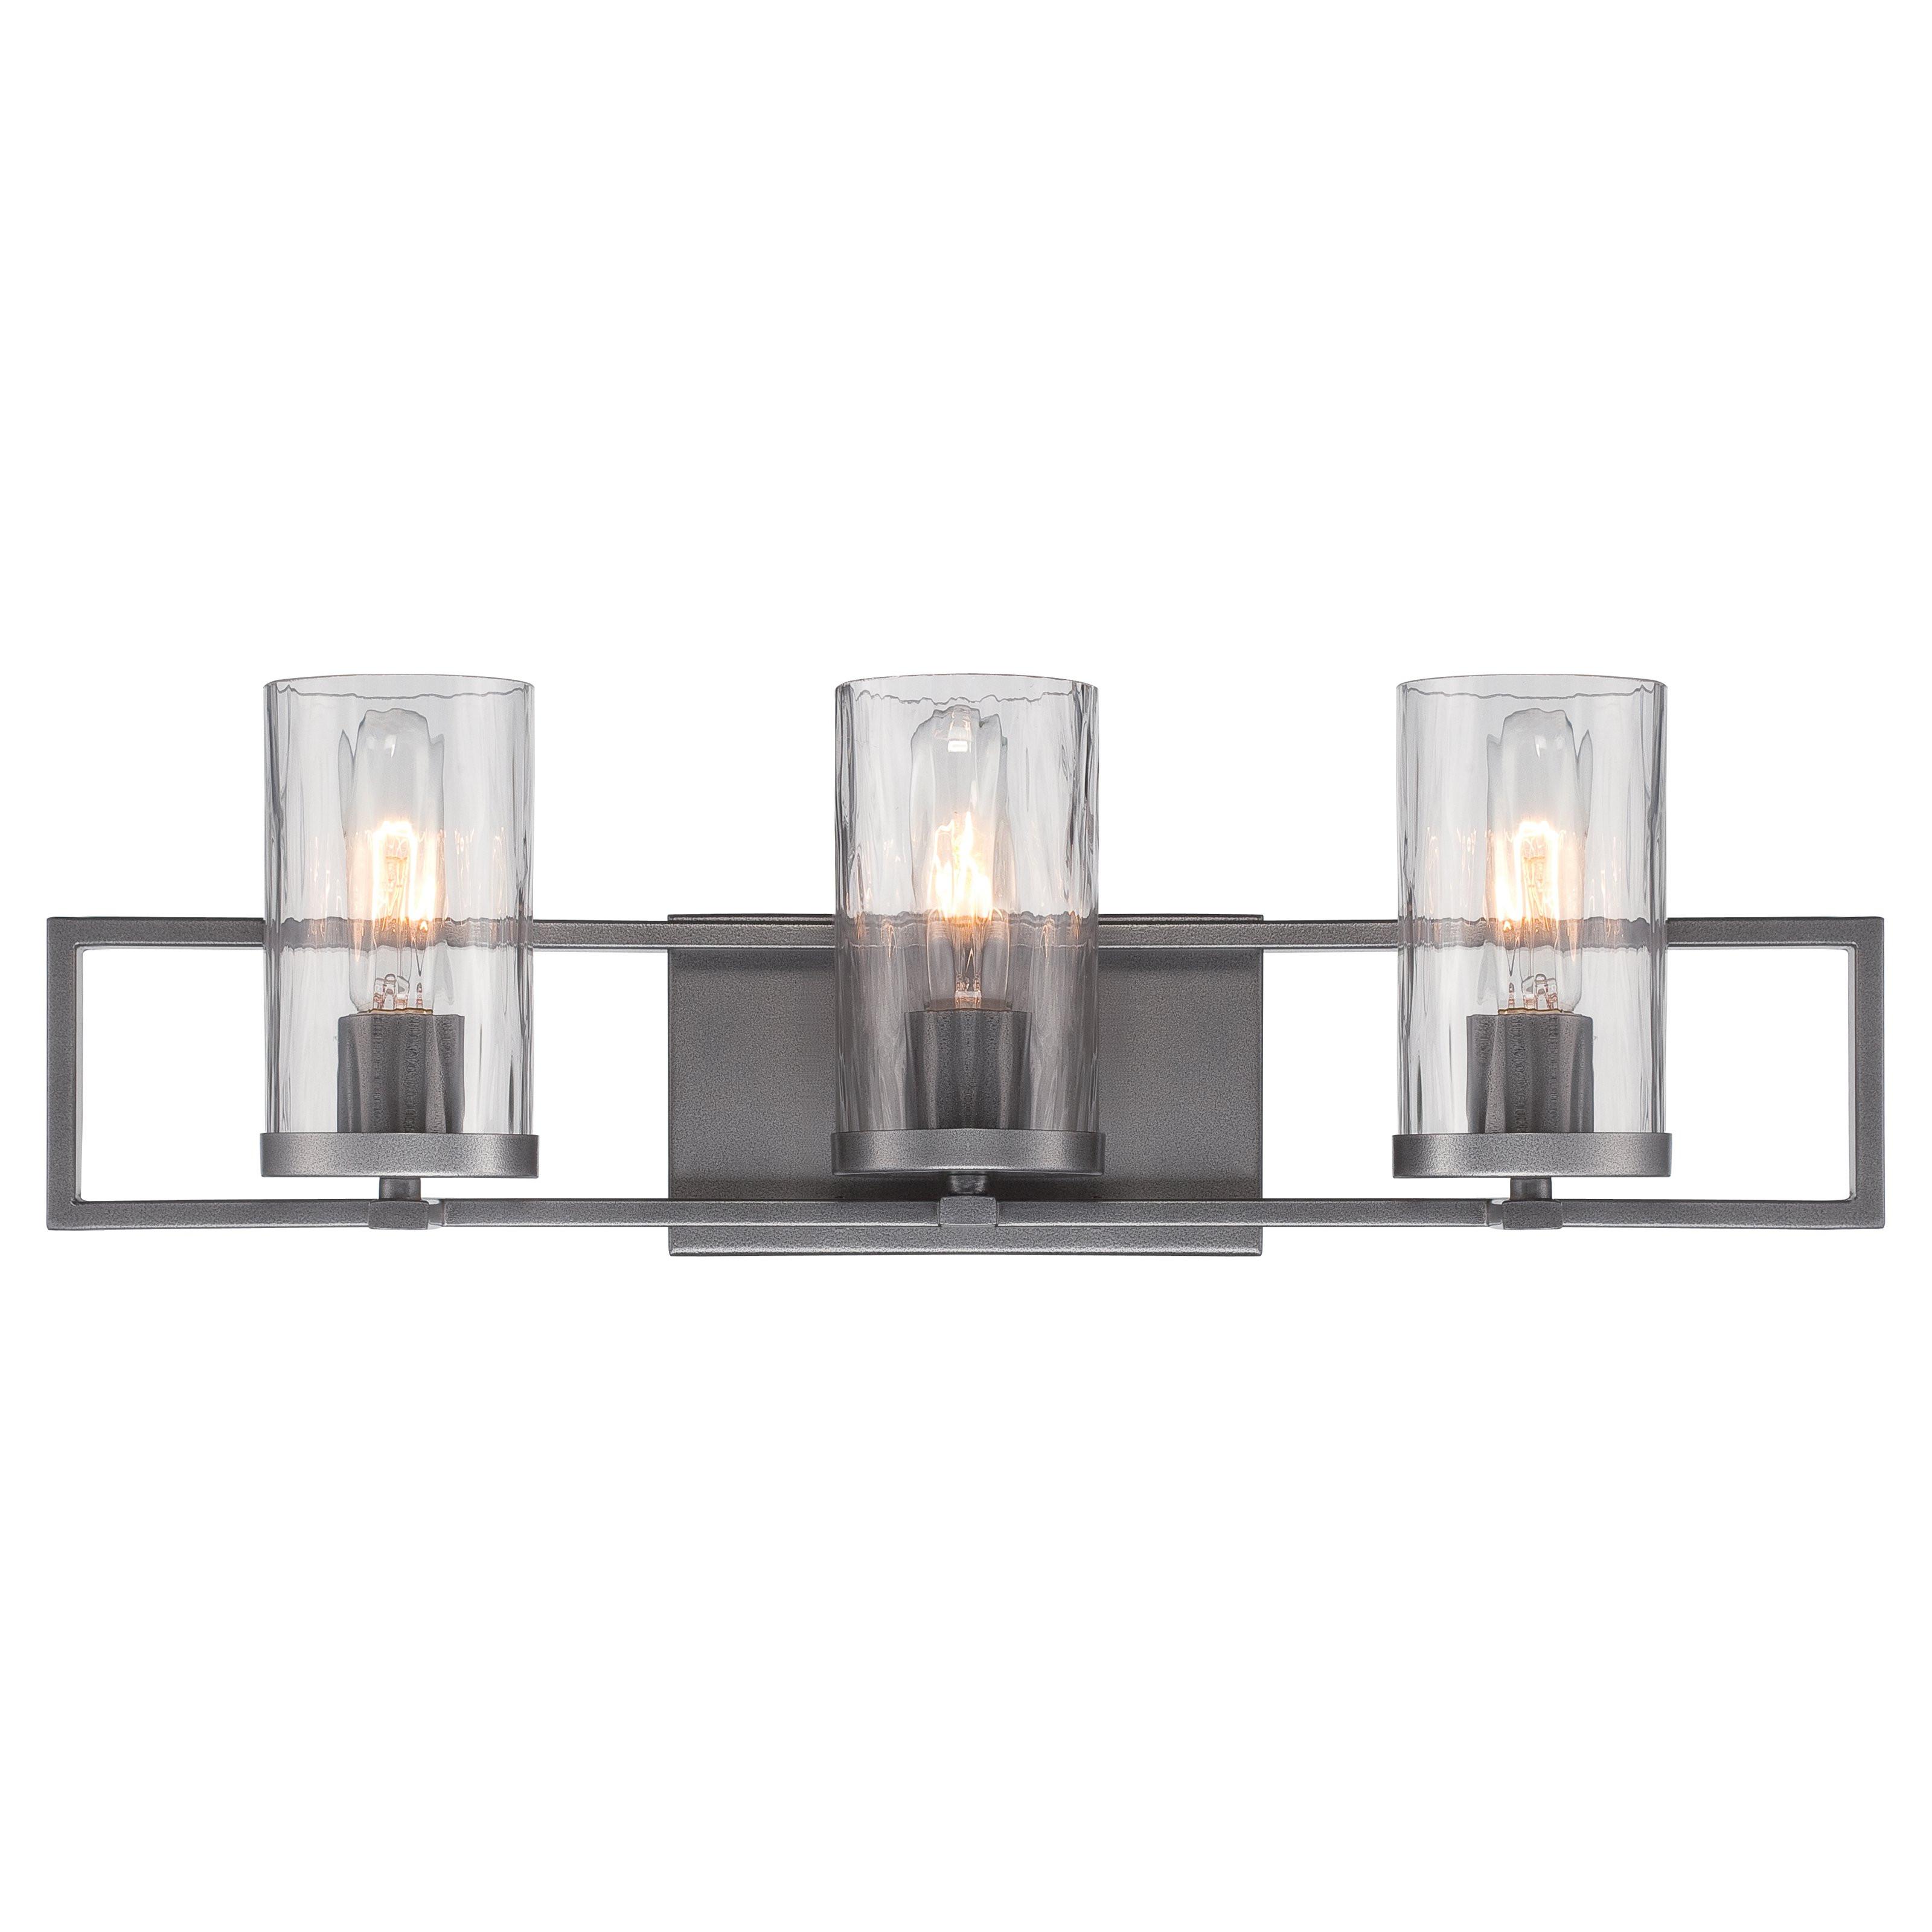 Best ideas about Bathroom Light Bar . Save or Pin Designers Fountain Elements 3 Light Bath Bar Now.